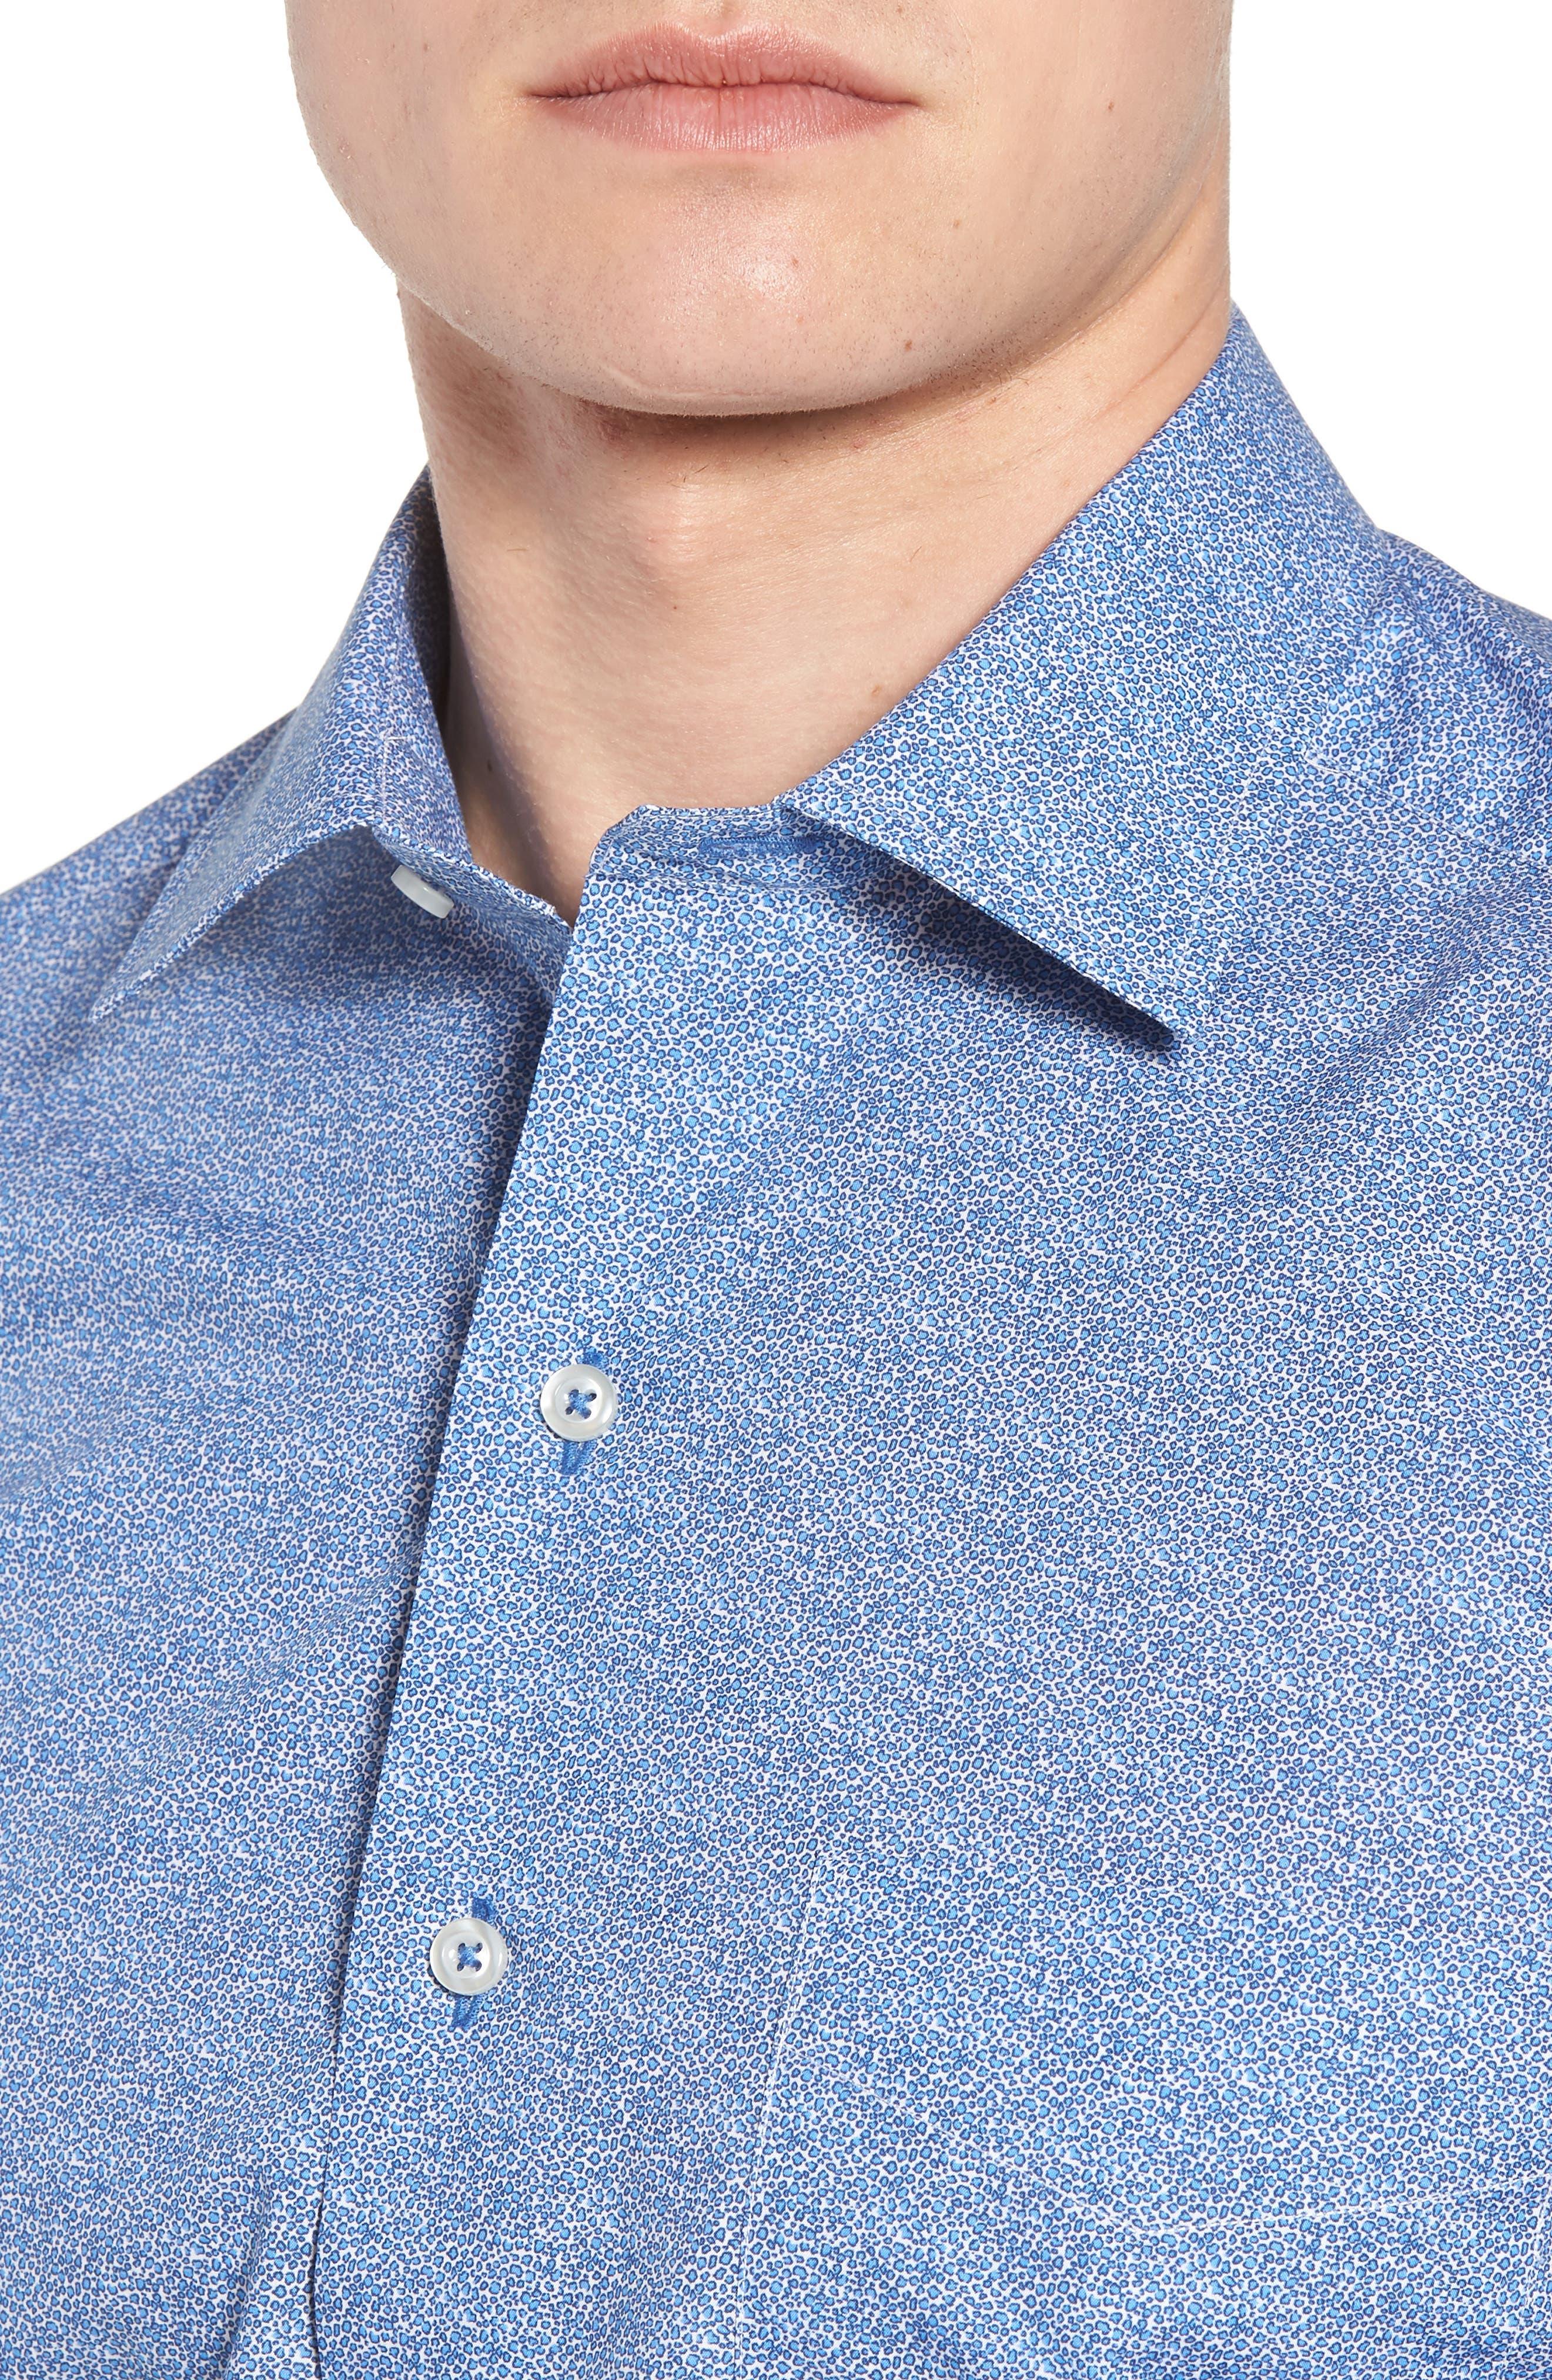 Regular Fit Microprint Sport Shirt,                             Alternate thumbnail 4, color,                             Blue